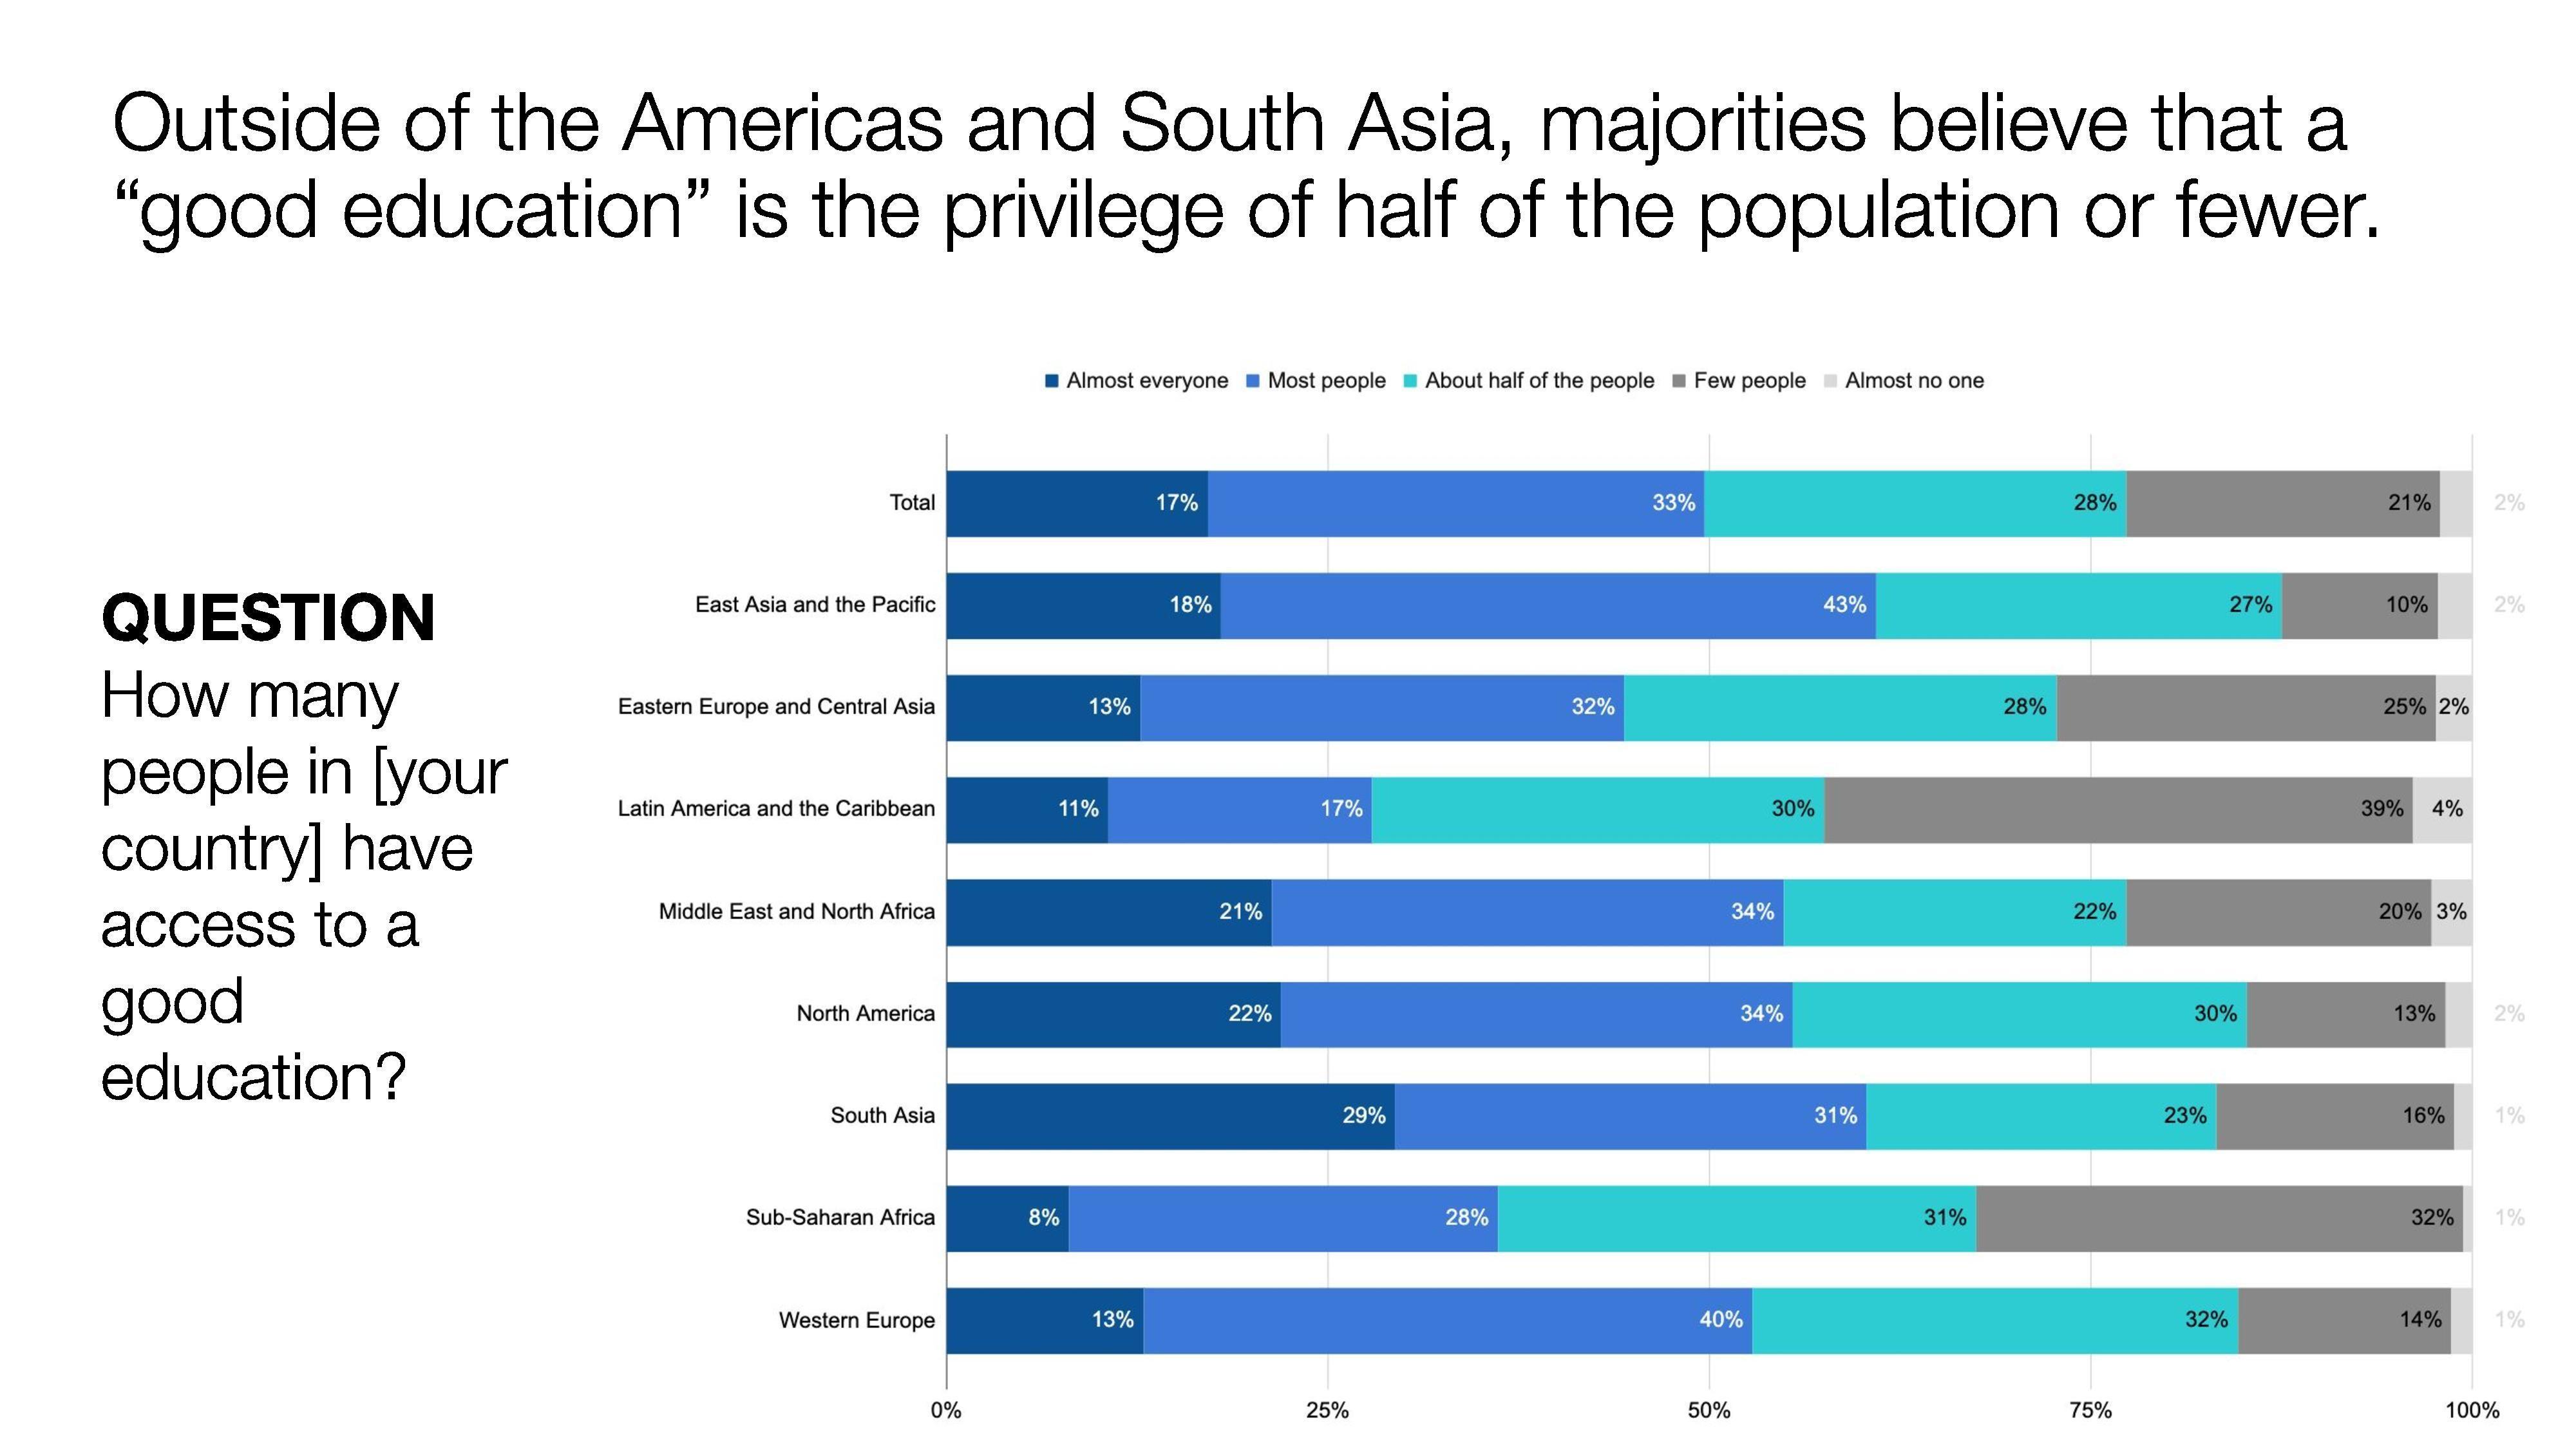 education jobs Asia Fourth work schools future generations